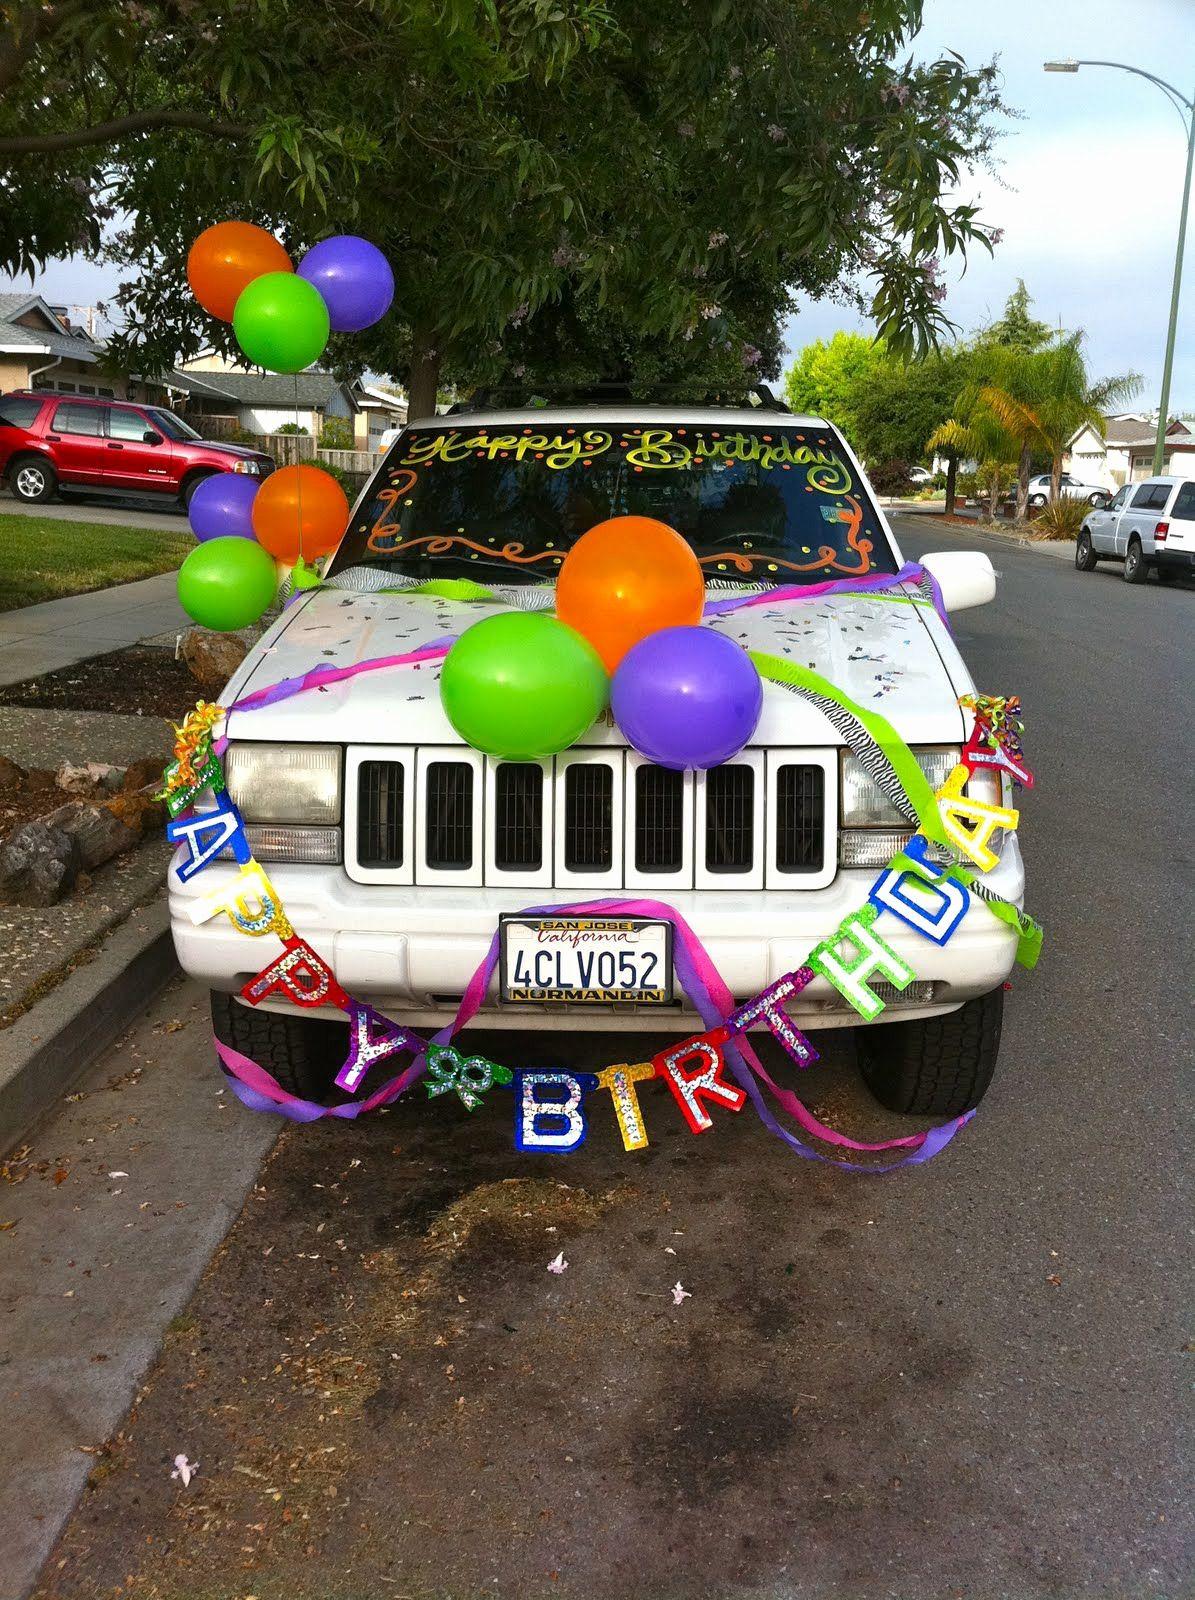 birthday surprise for friend 88139 Birthday surprises